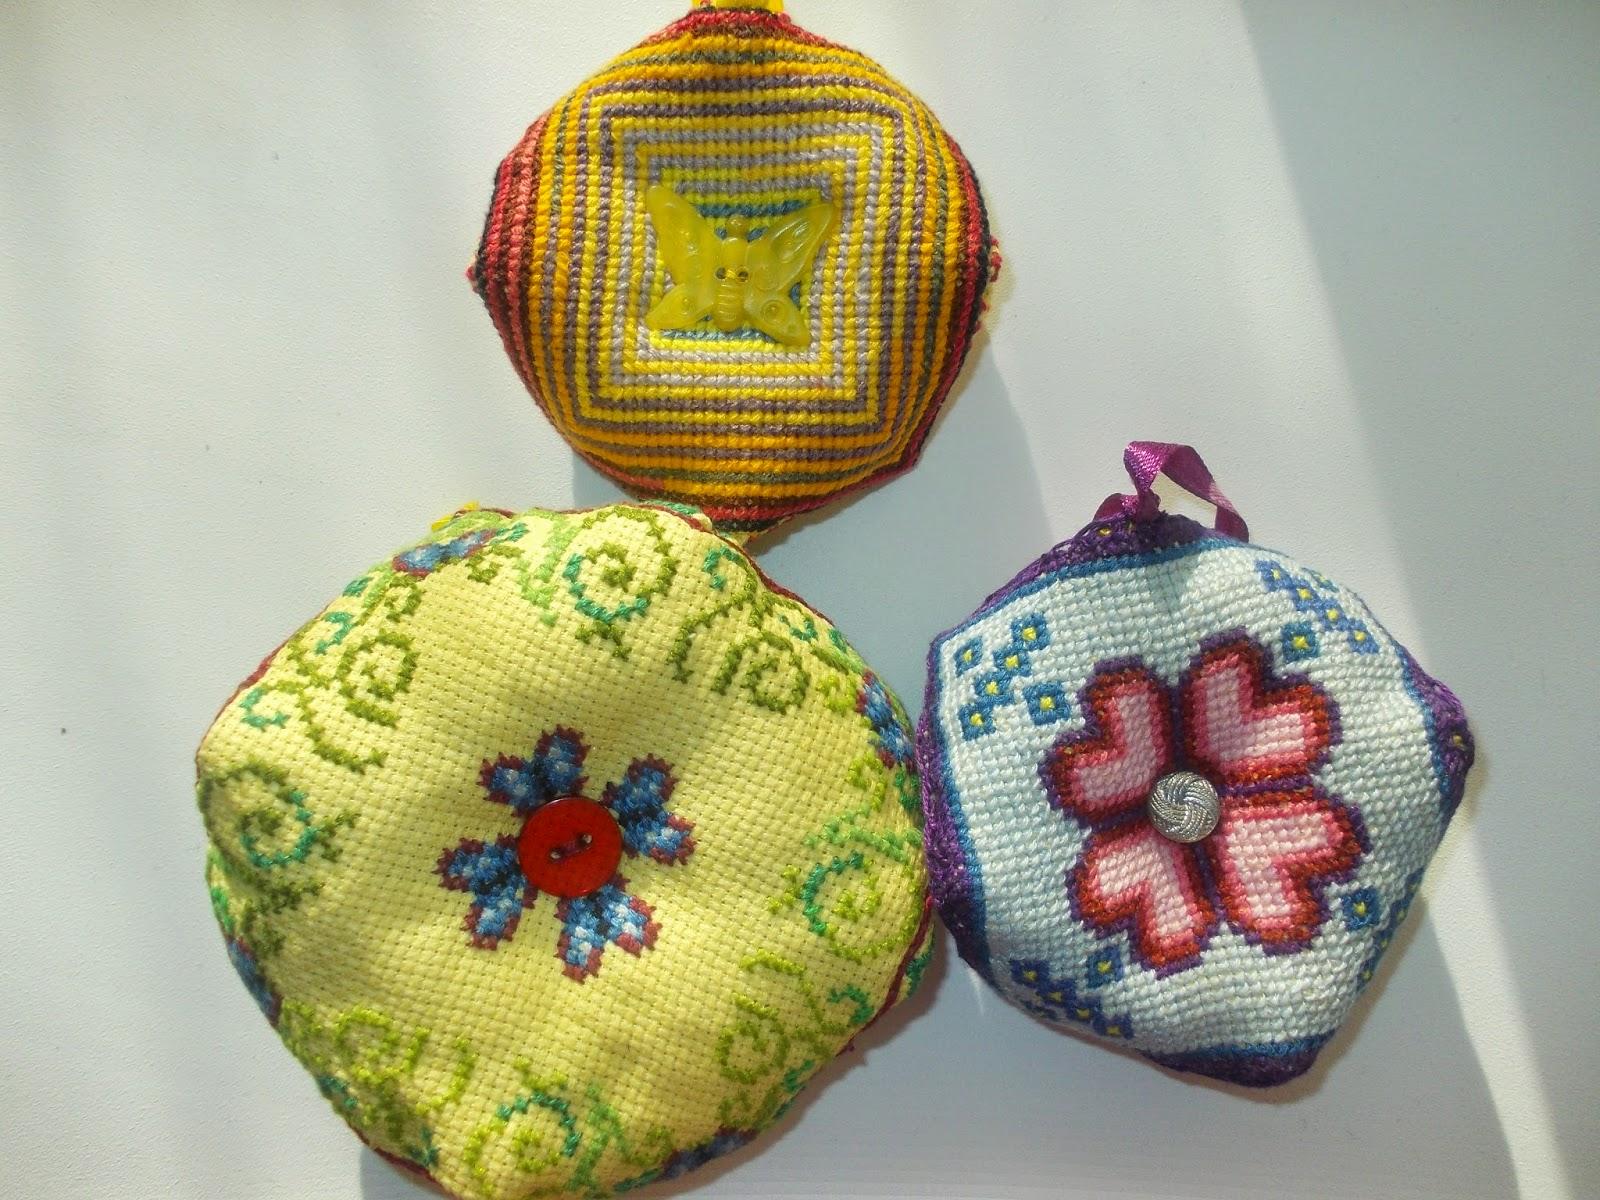 вышивка-бискорню